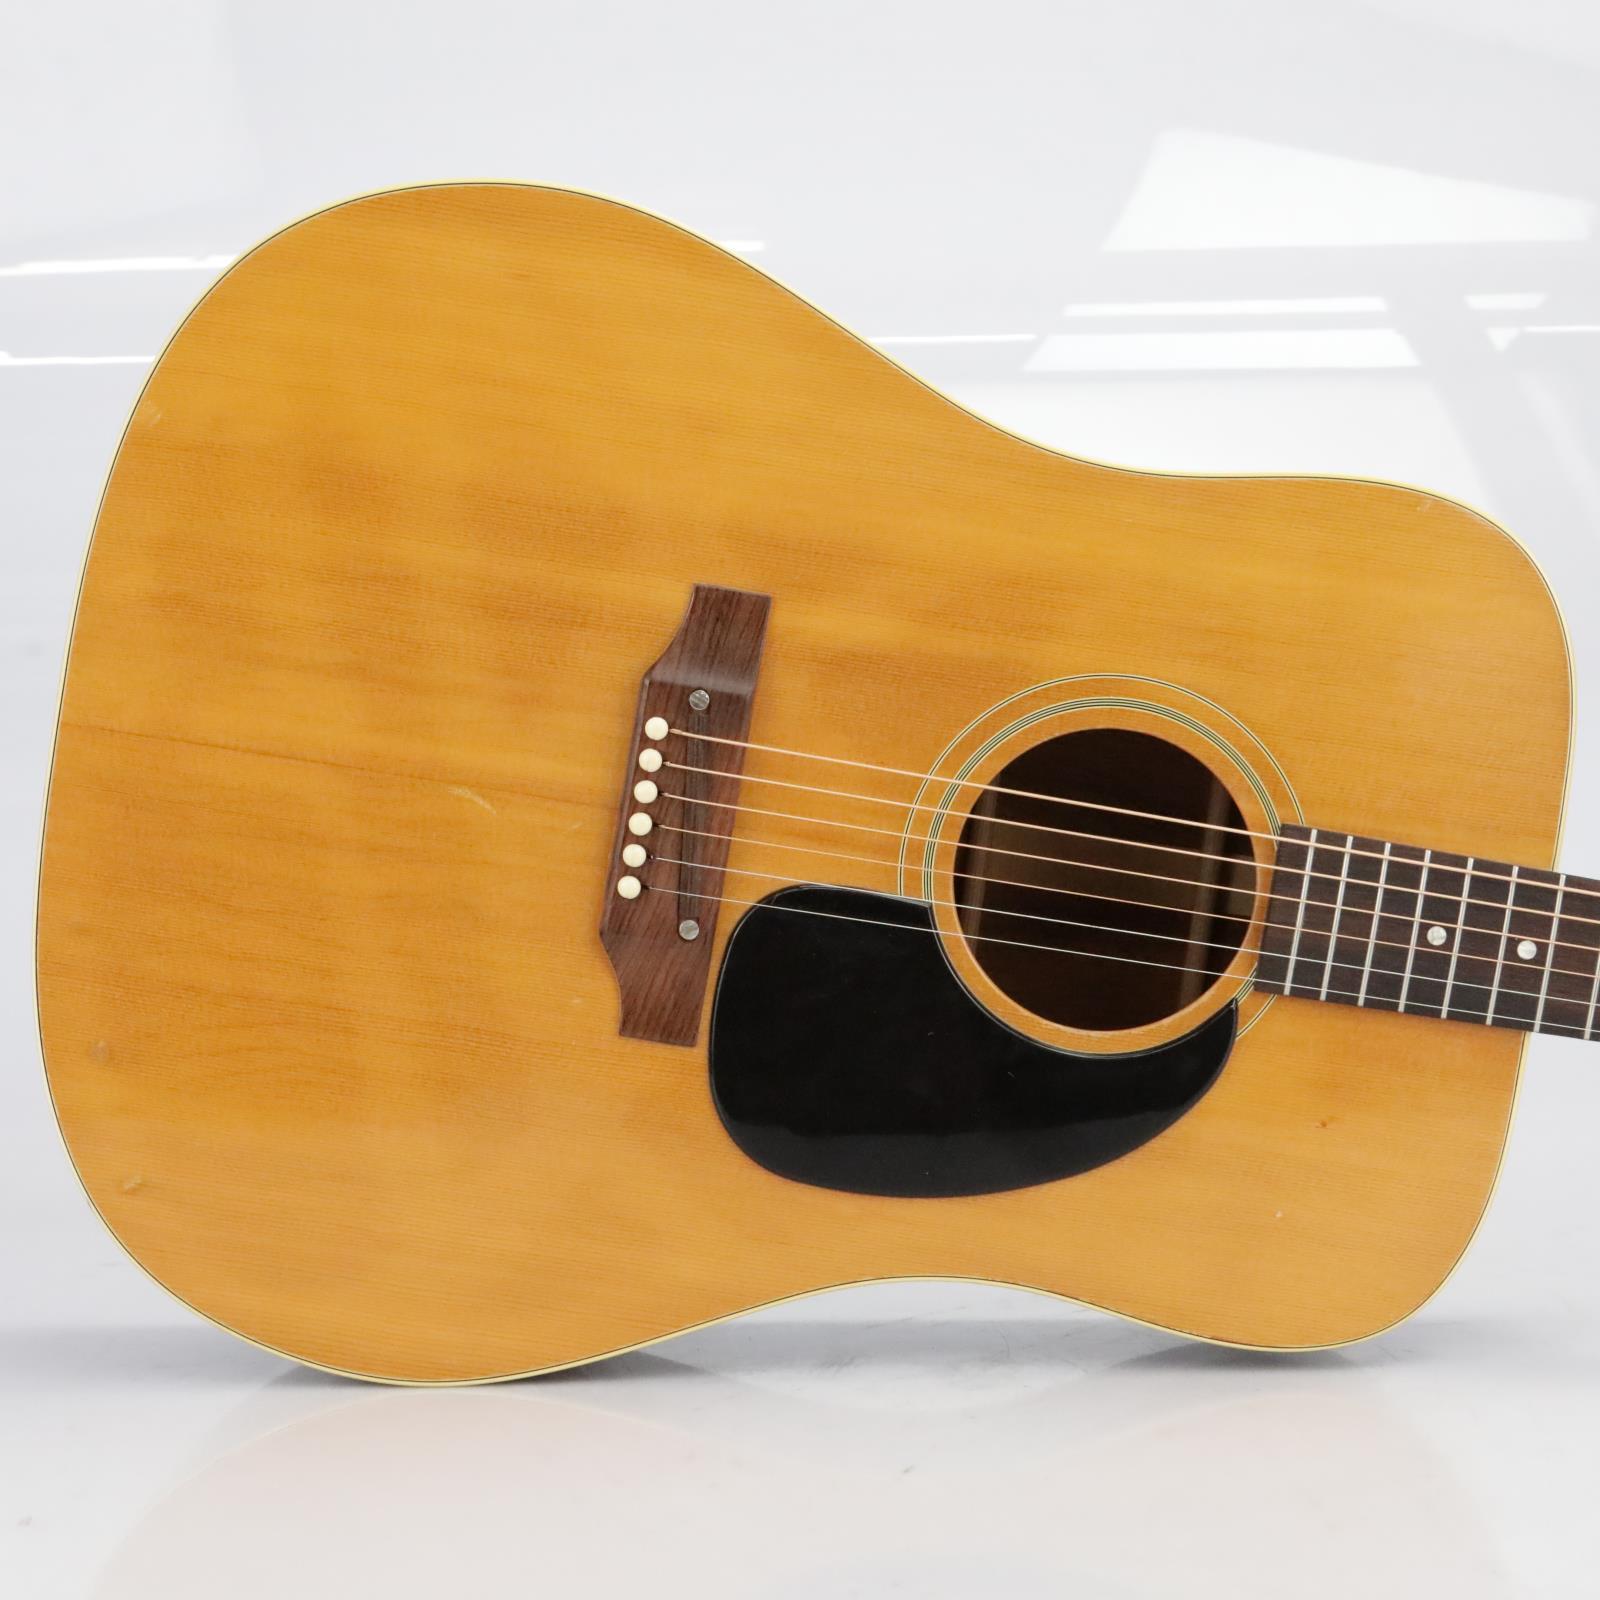 1969 Gibson J-50 Acoustic Guitar w/ Hard Case #40182